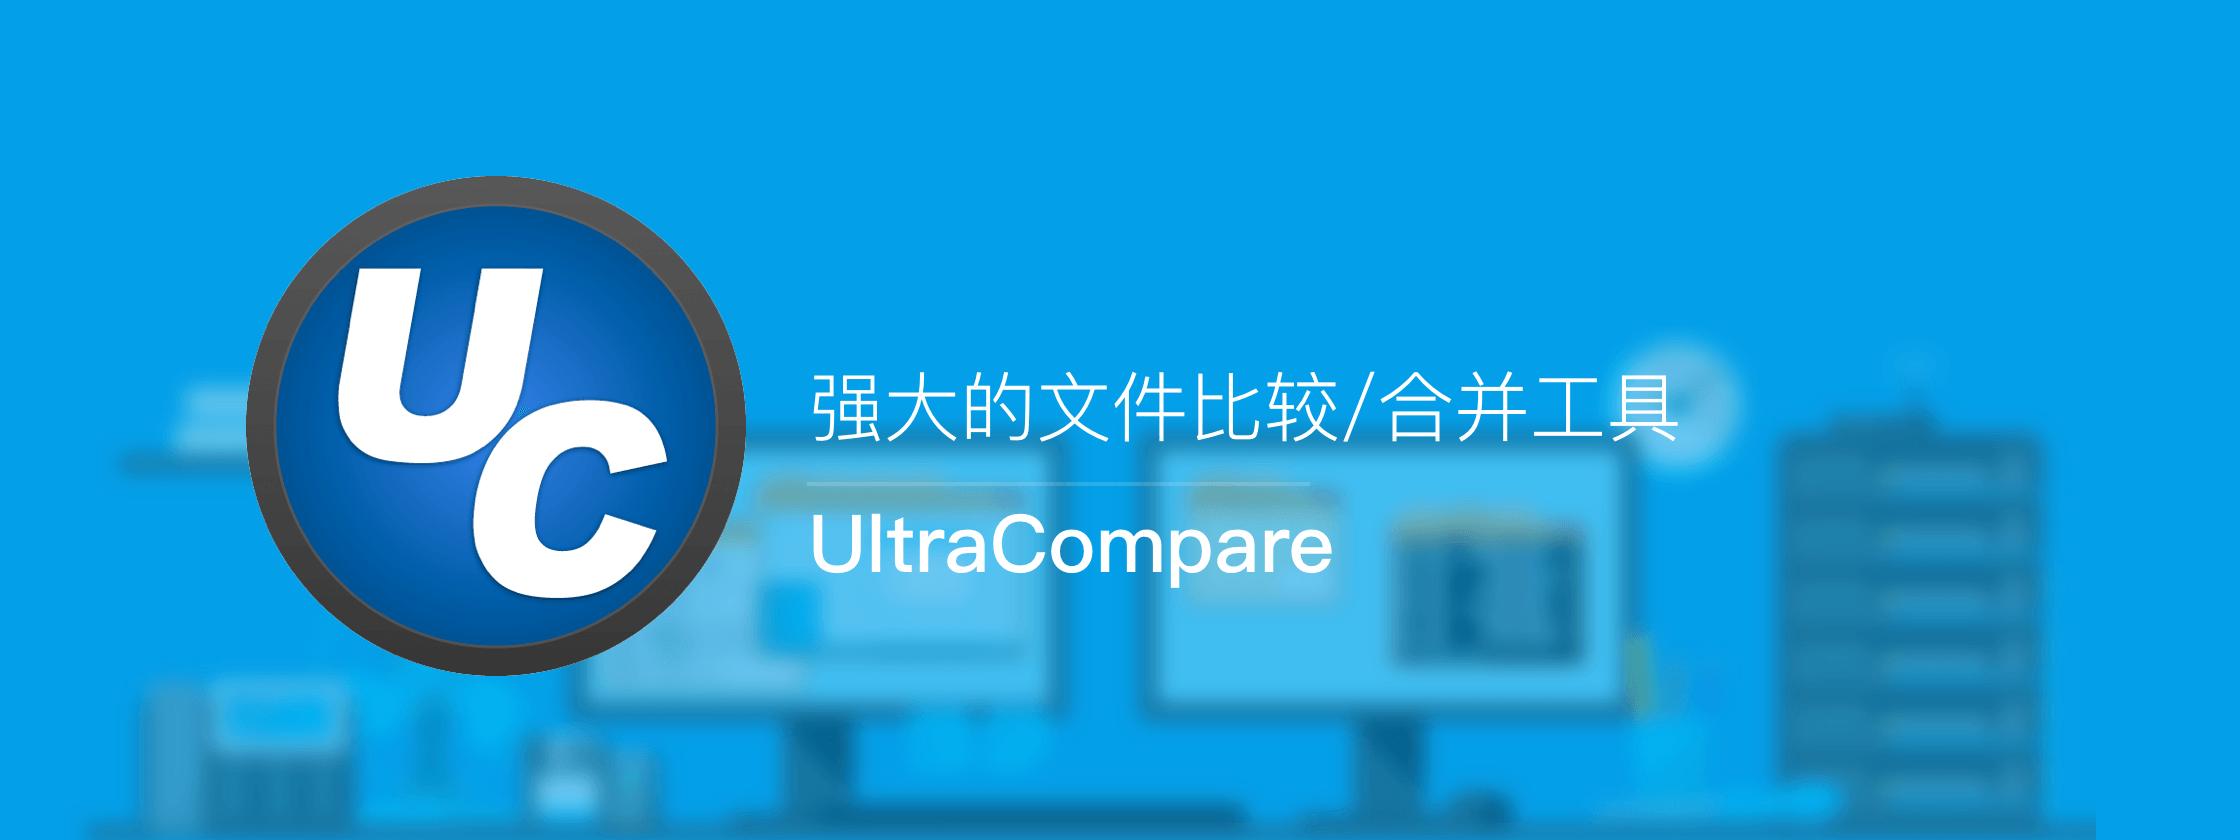 UltraCompare – 强大的文件比较/合并工具